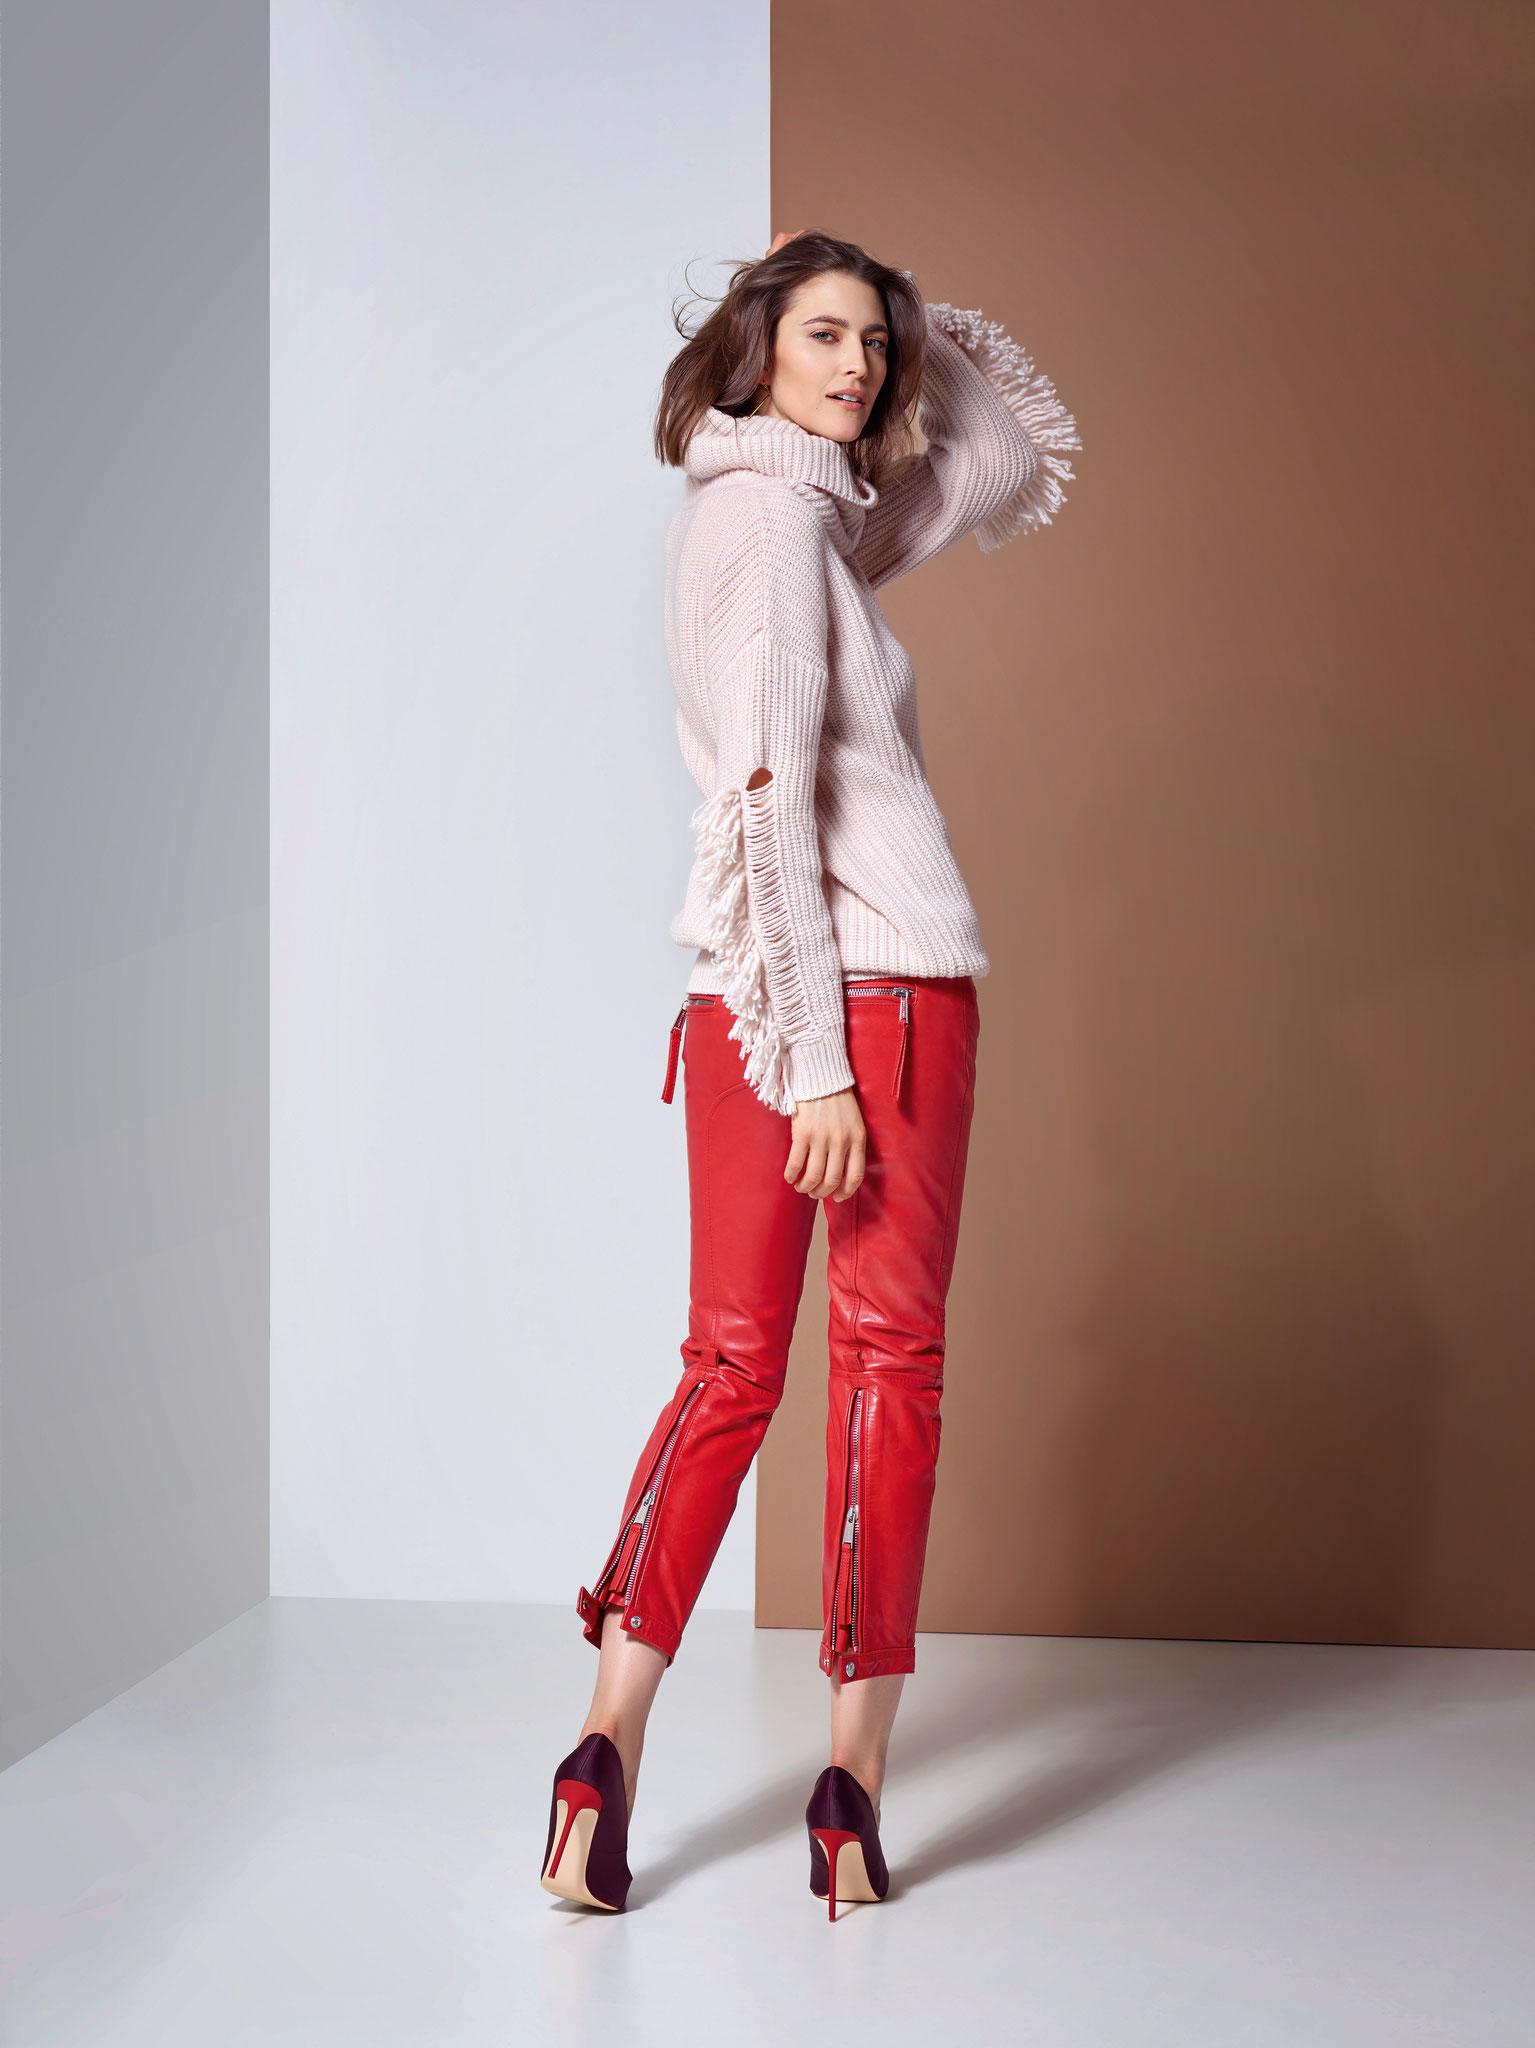 Esisto Herbst Winter 2018 Cashmere Mode neu